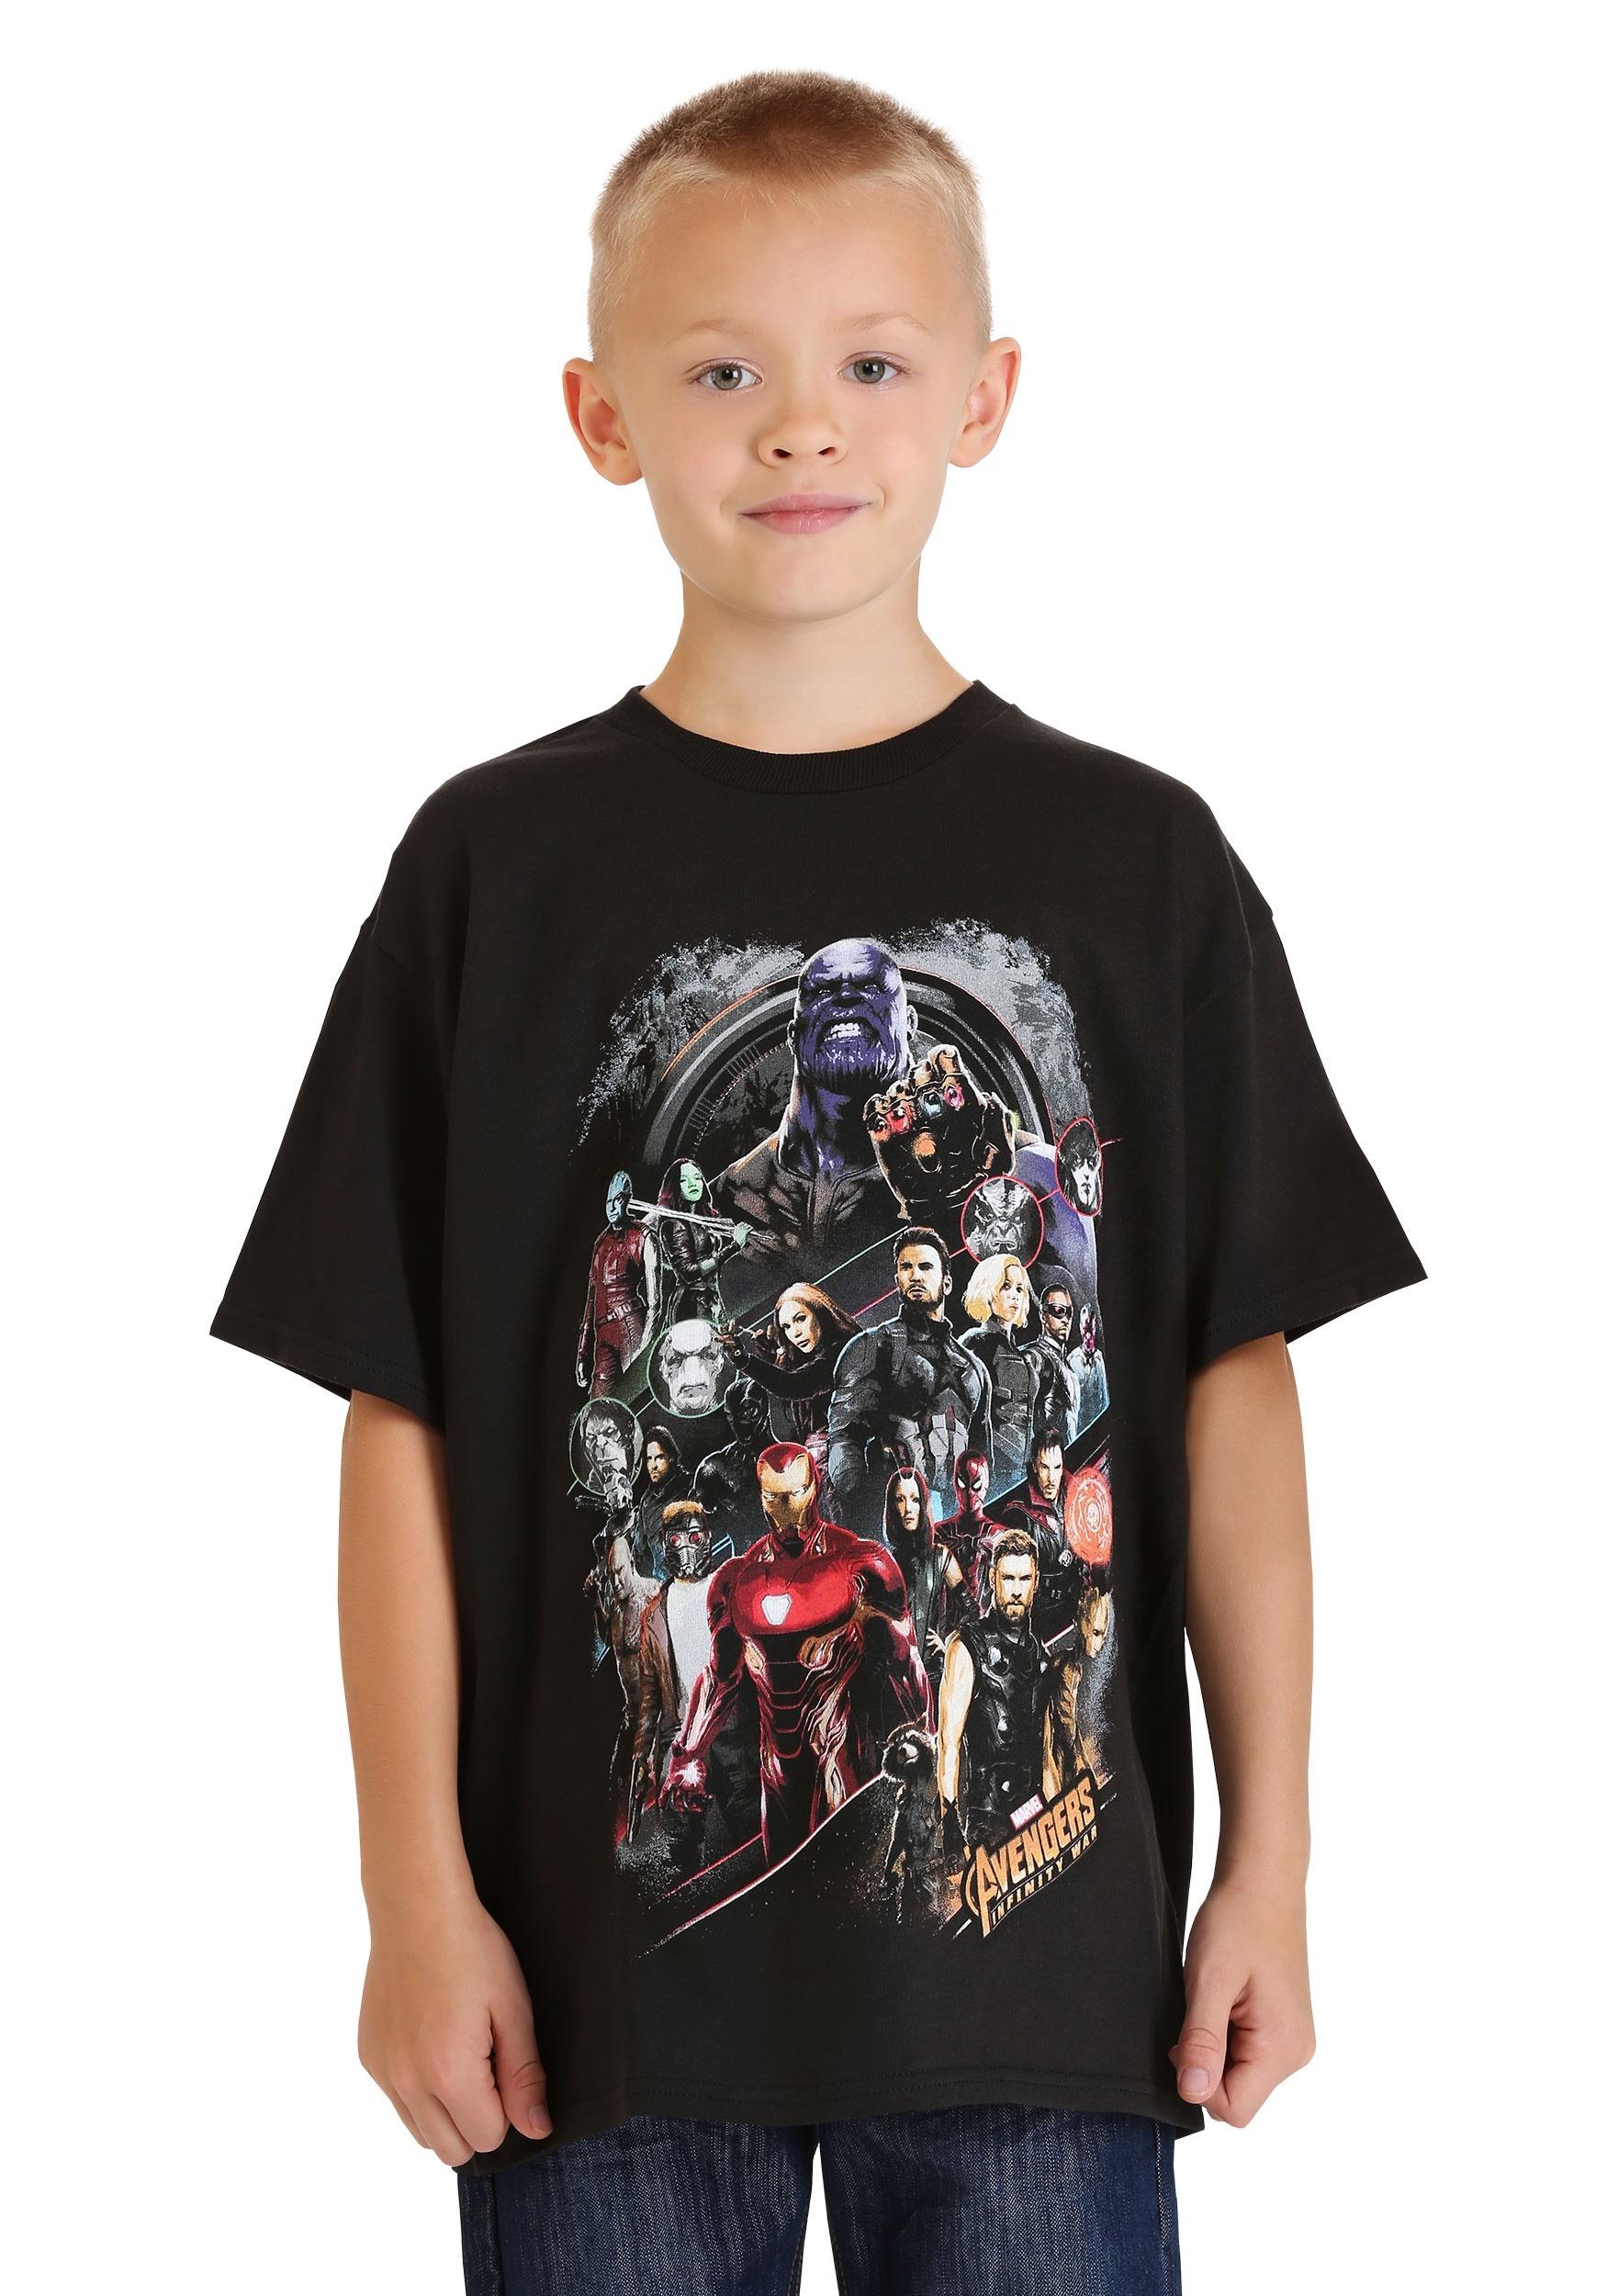 Boys Avengers Infinity War Group Shot Youth T-Shirt